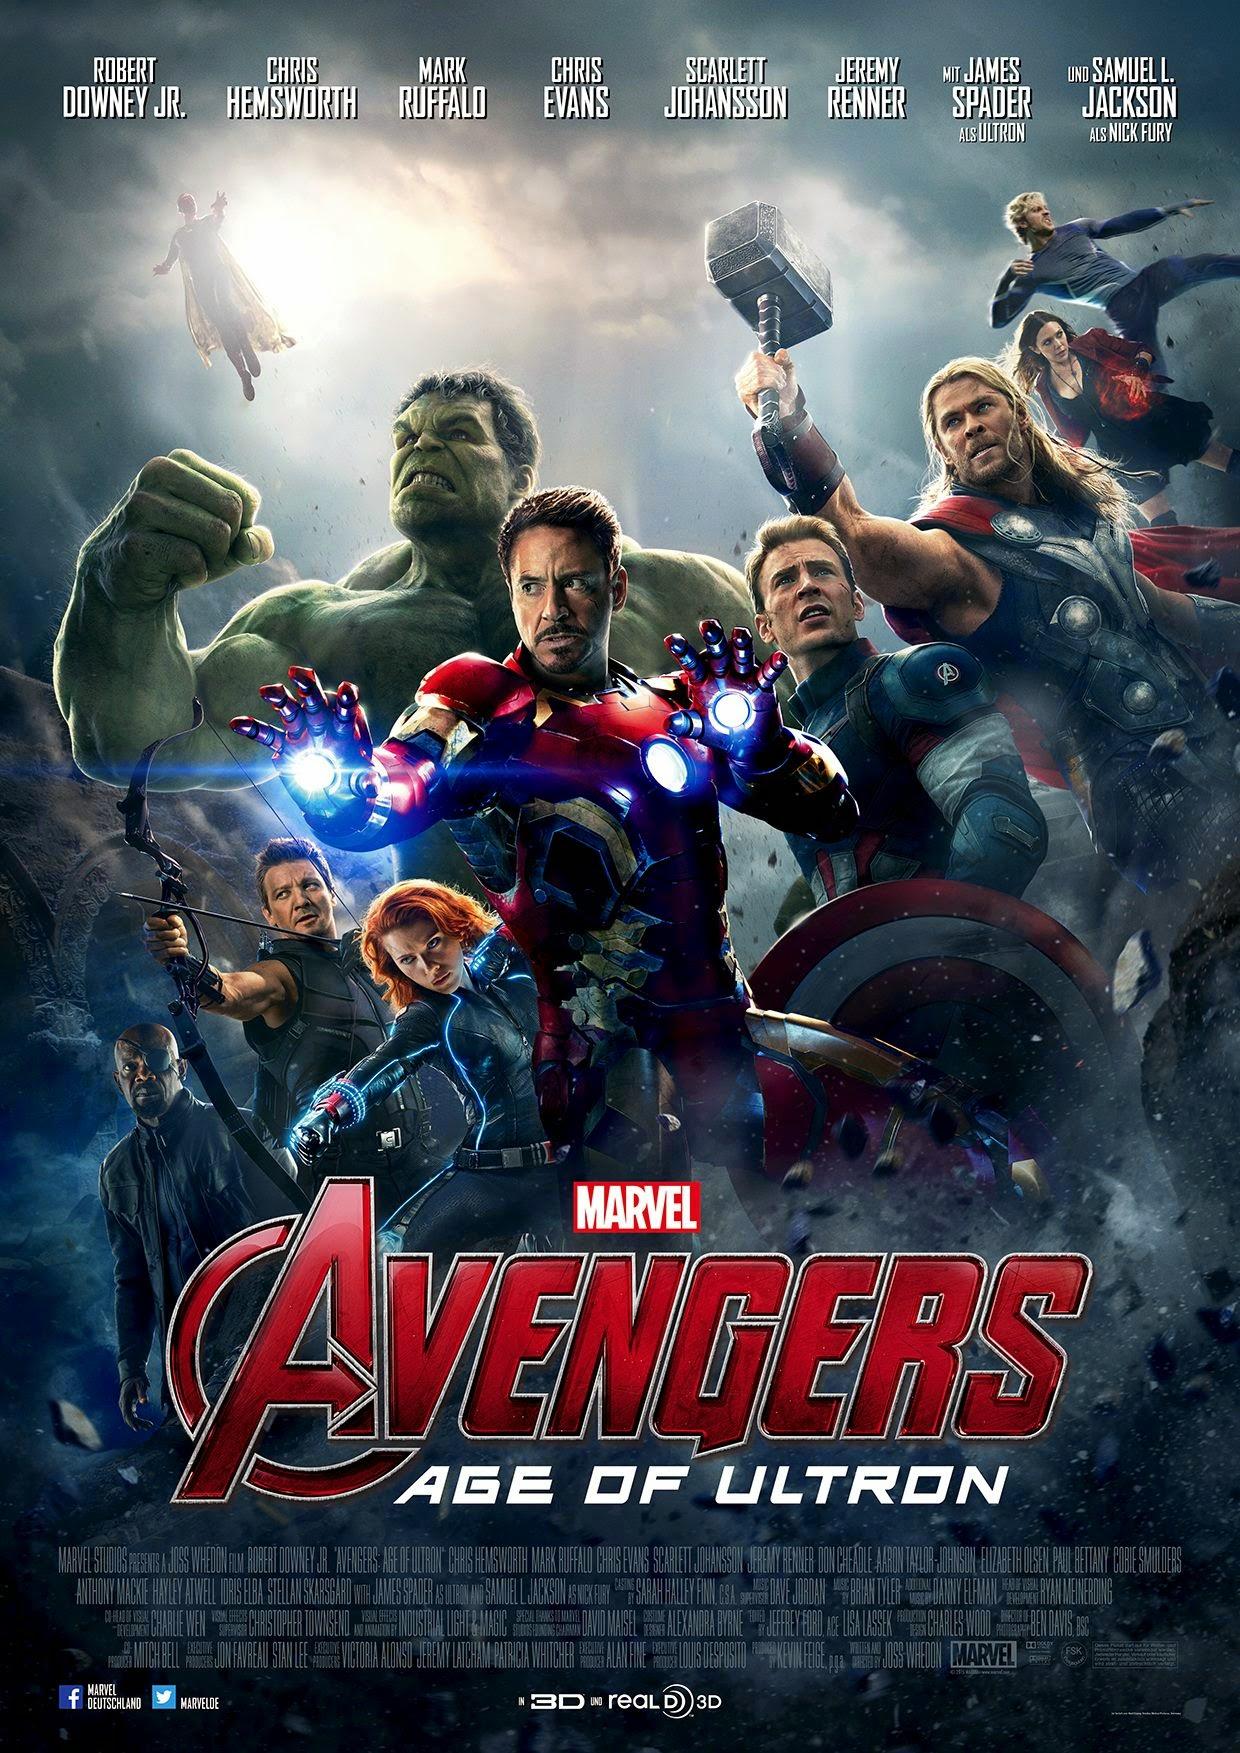 avengers czas ultrona plakat film recenzja iron man robert downey